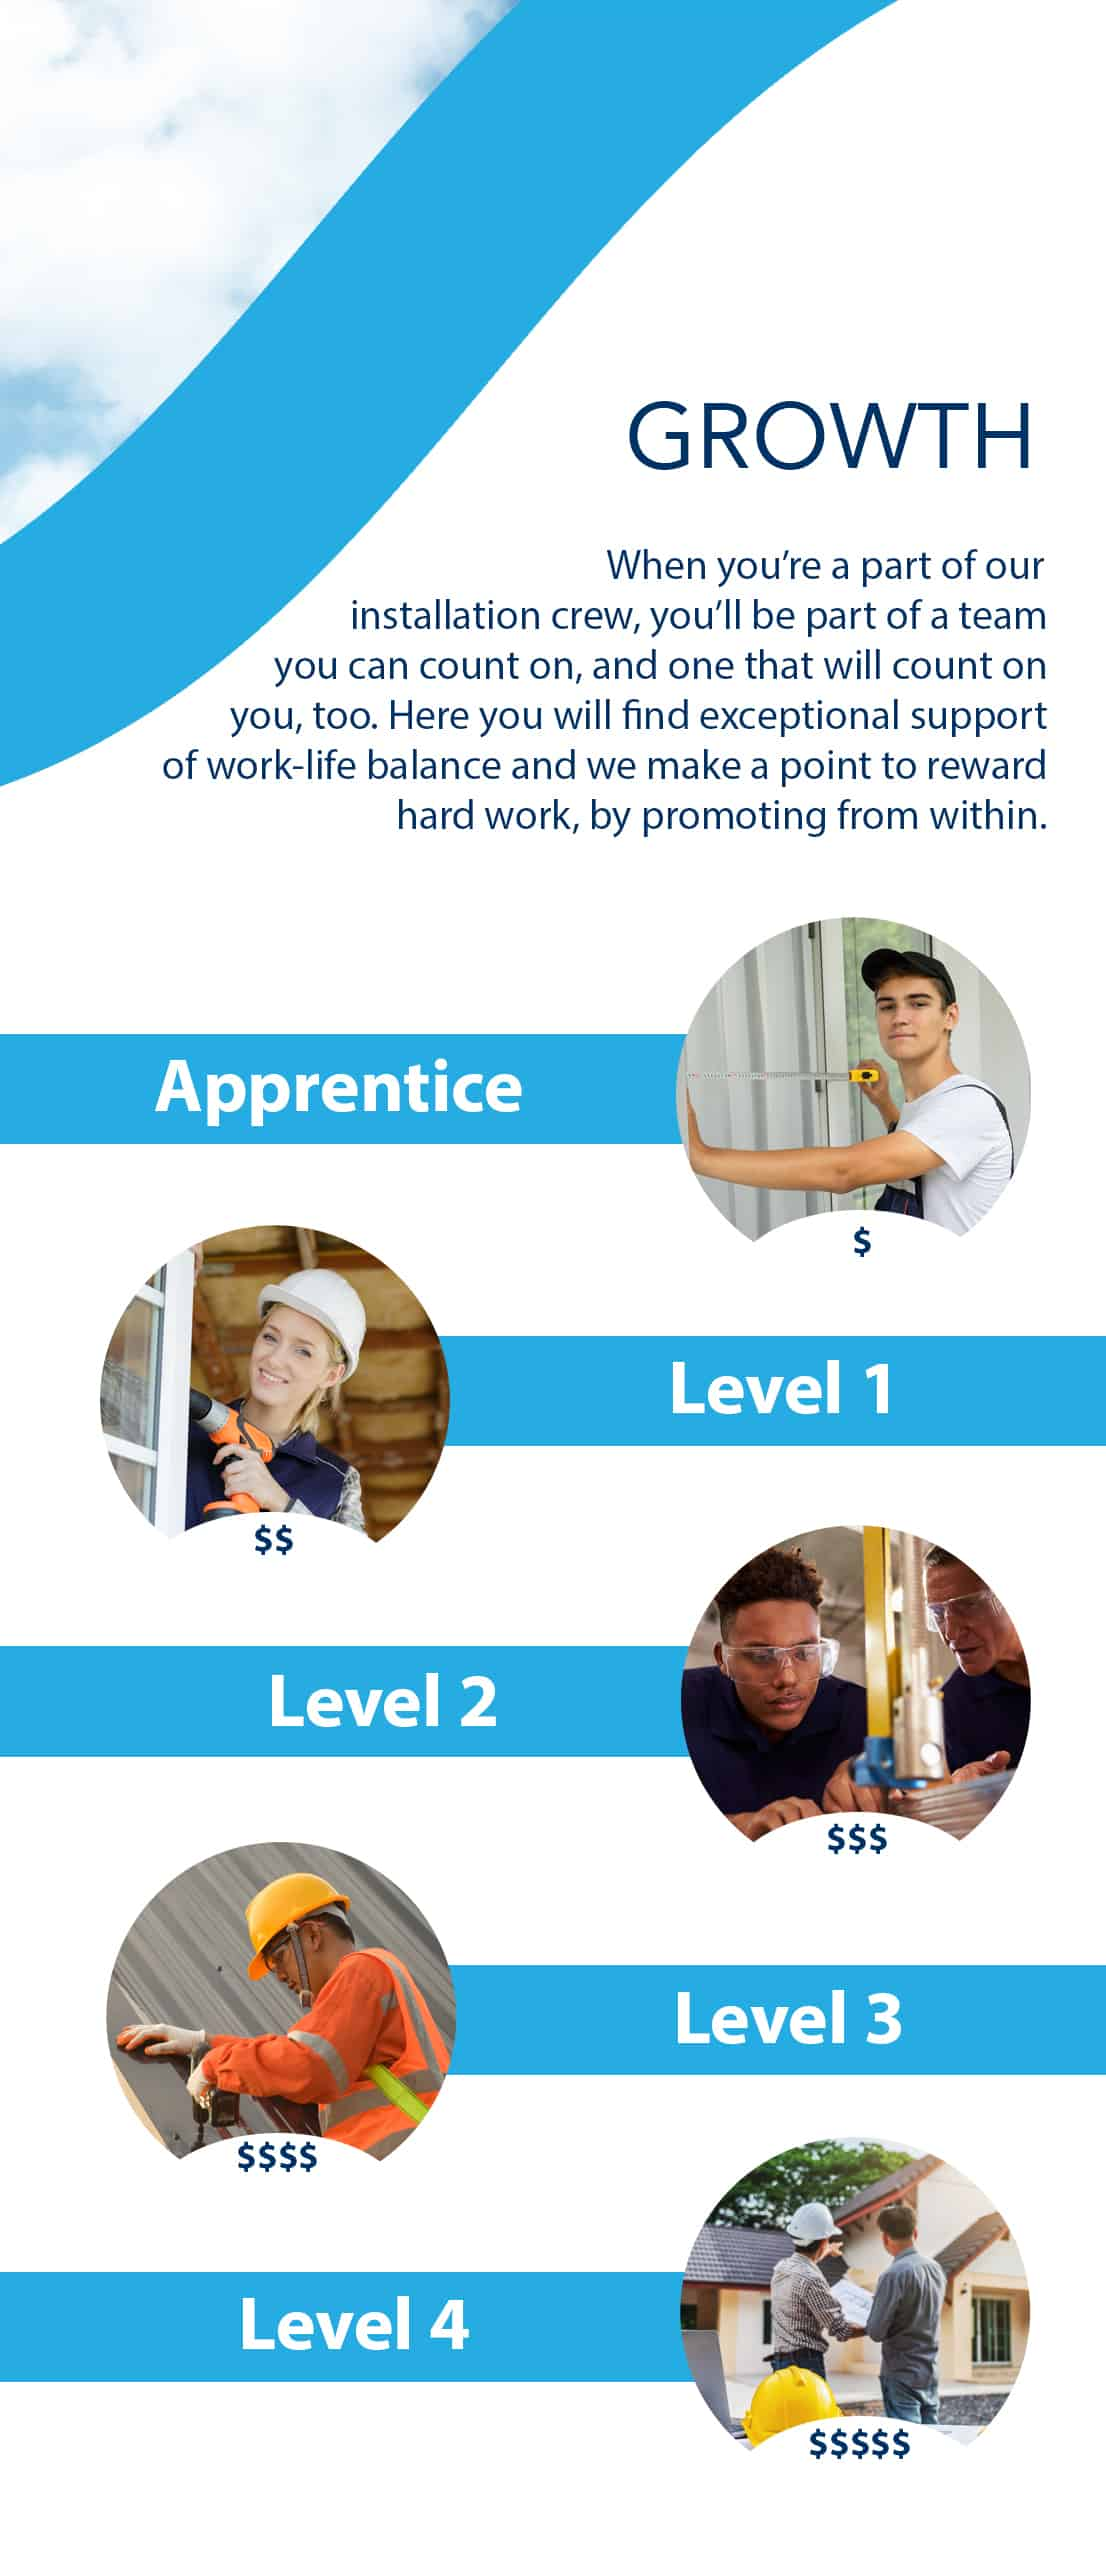 Weather Tight Apprenticeship Growth Plan